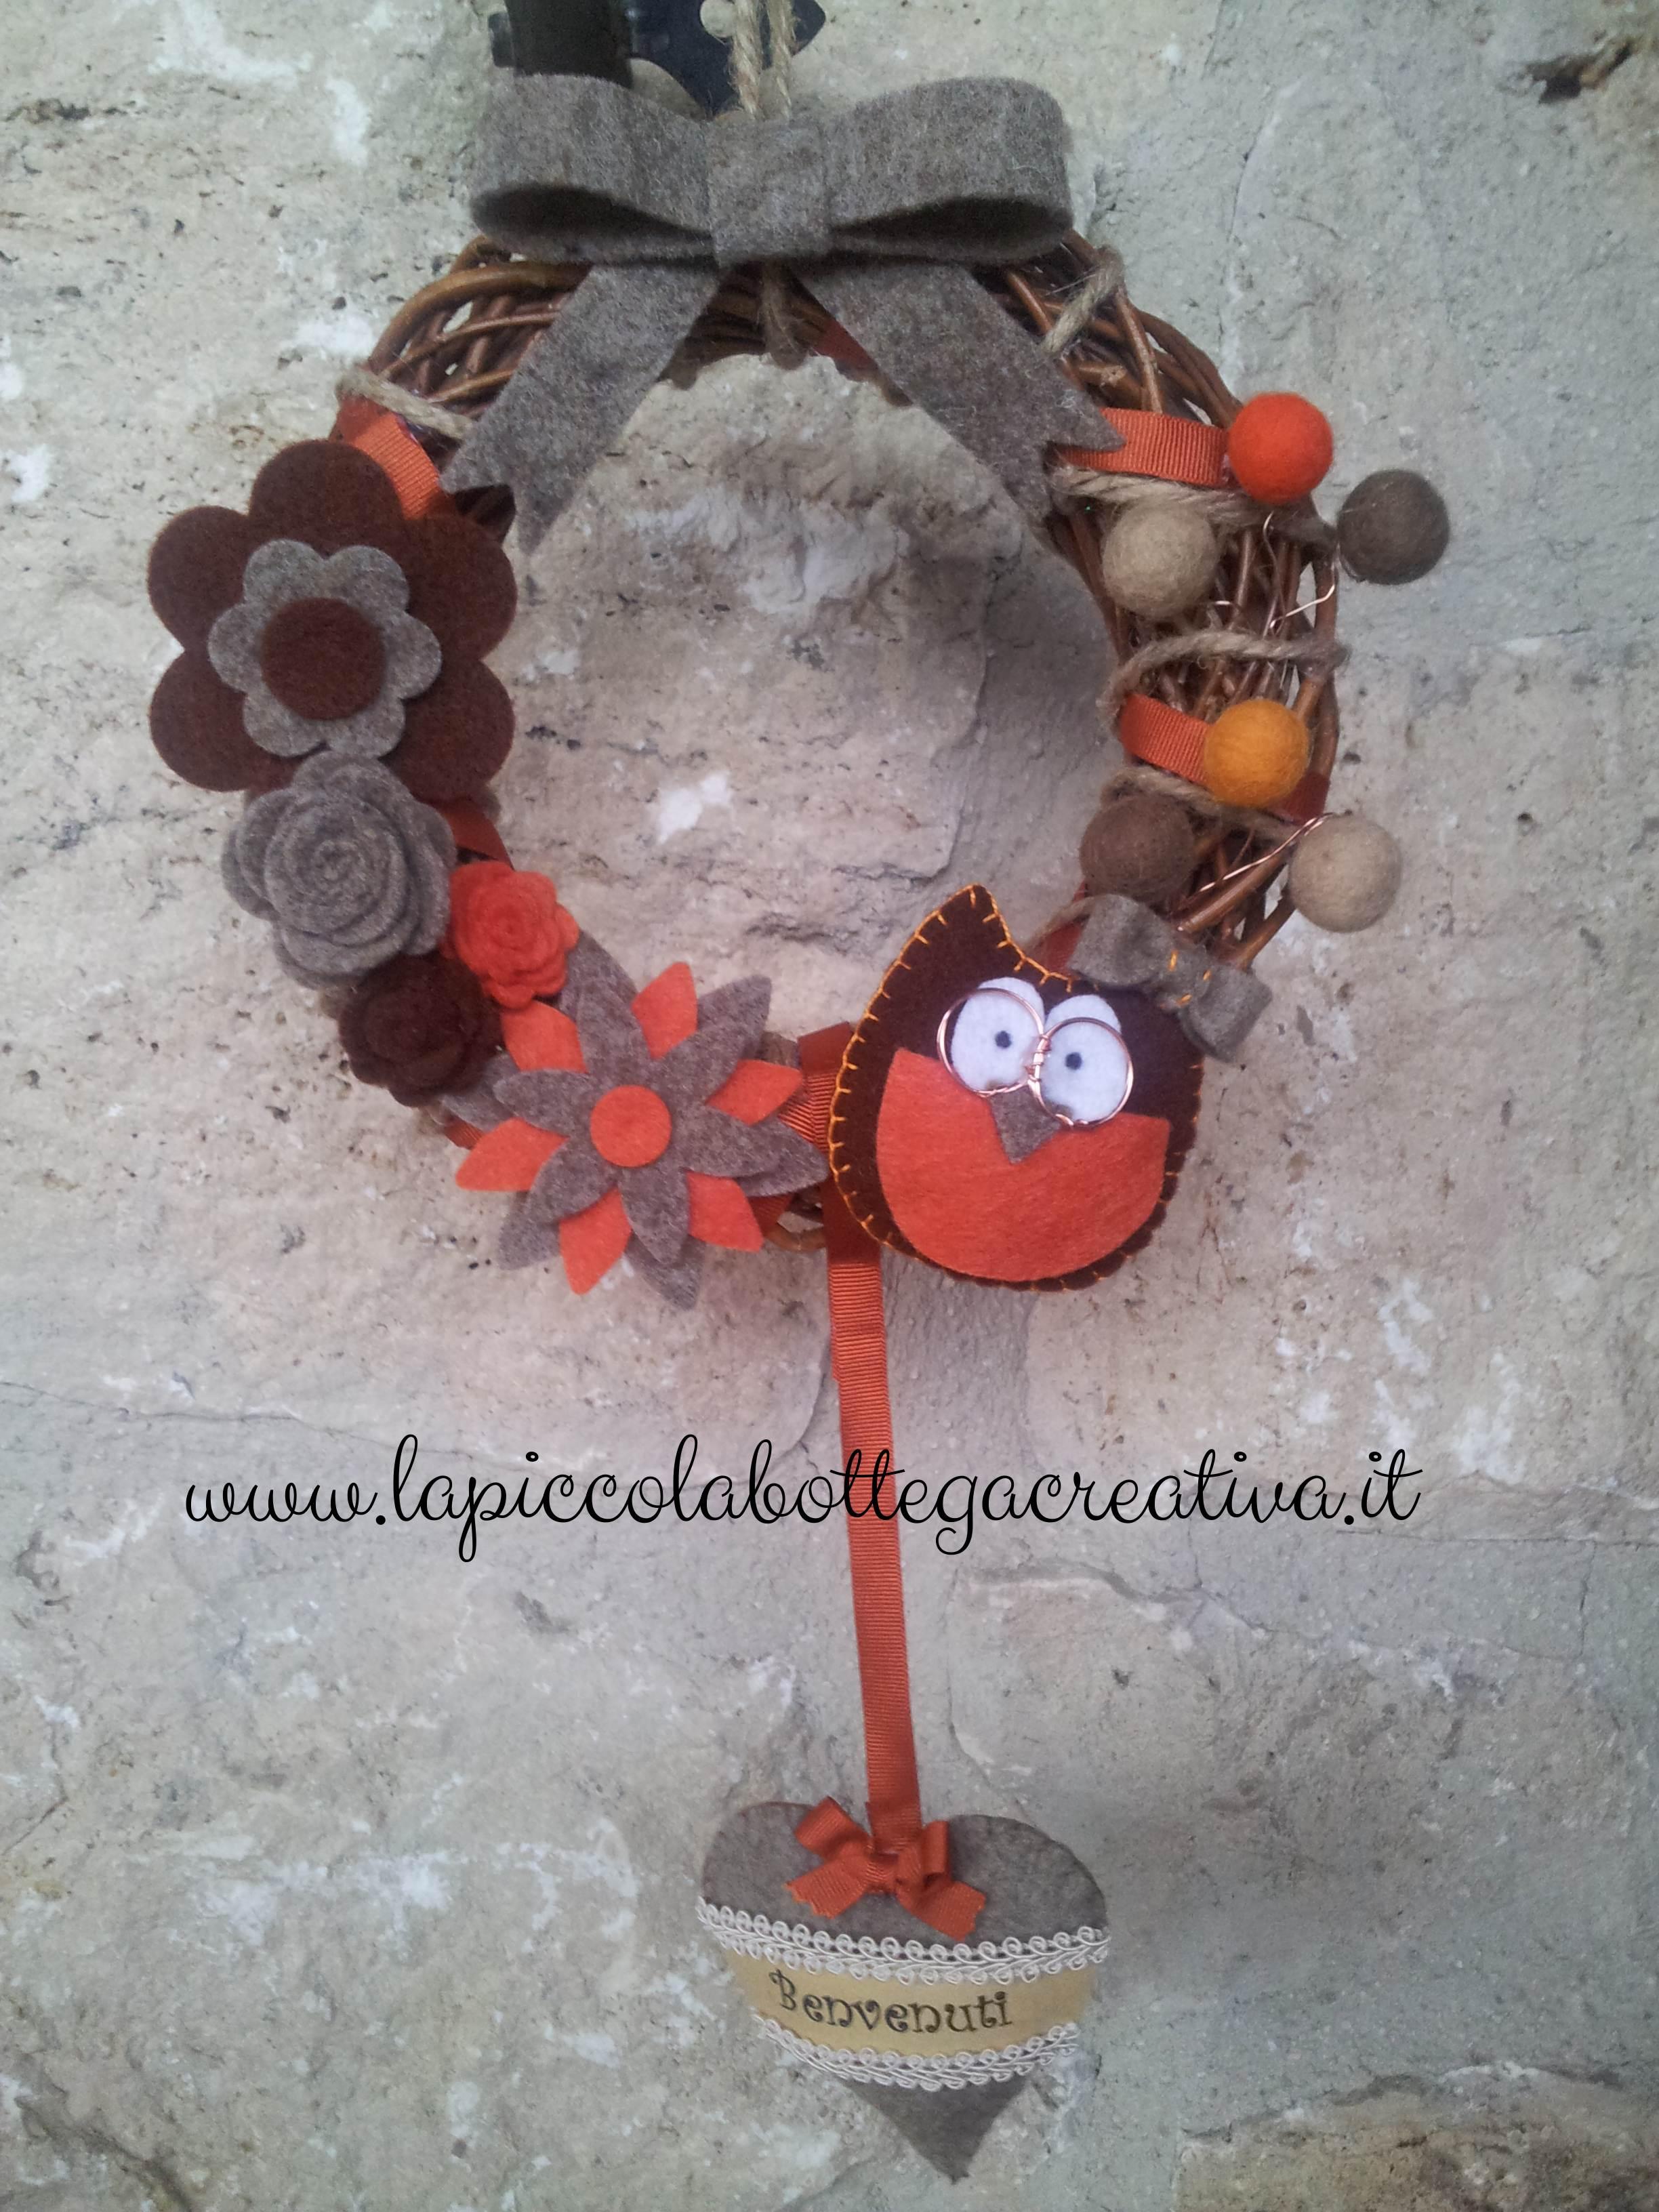 ghirlanda-fuoriporta-arancio-avana-decorata-fiori-gufo